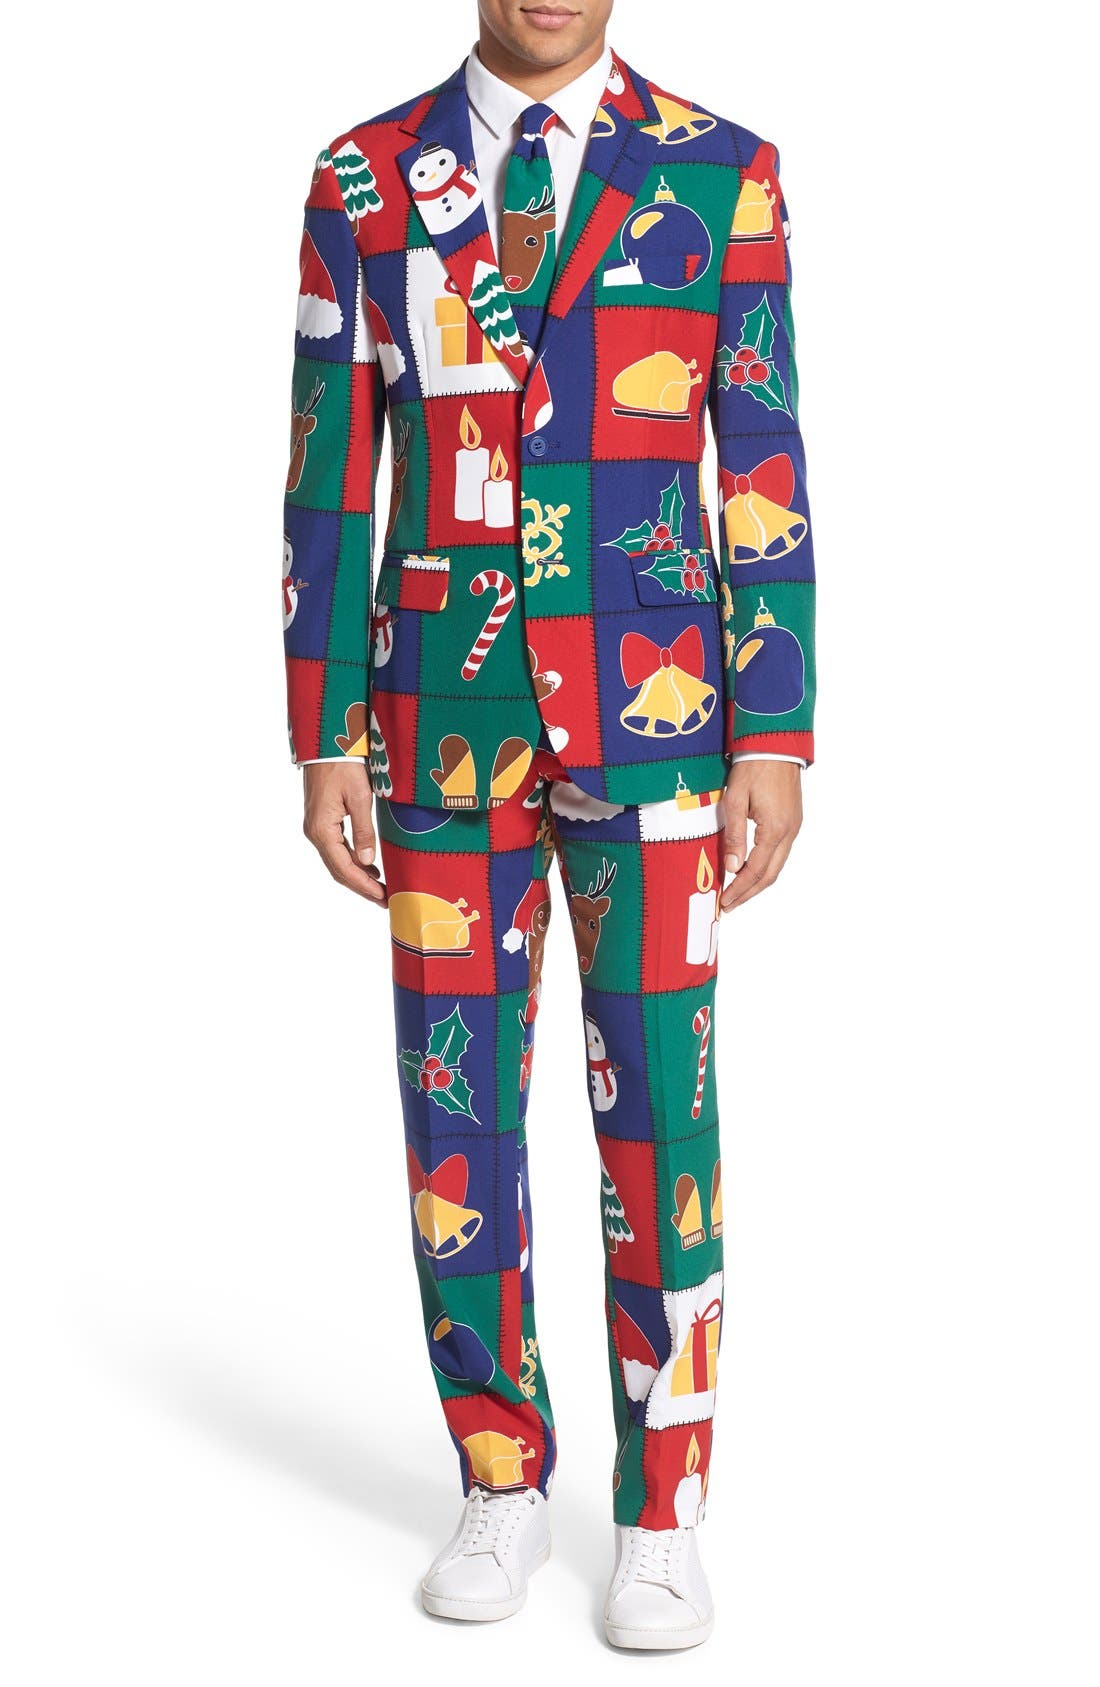 'Quilty Pleasure' Holiday Suit & Tie,                         Main,                         color, 300